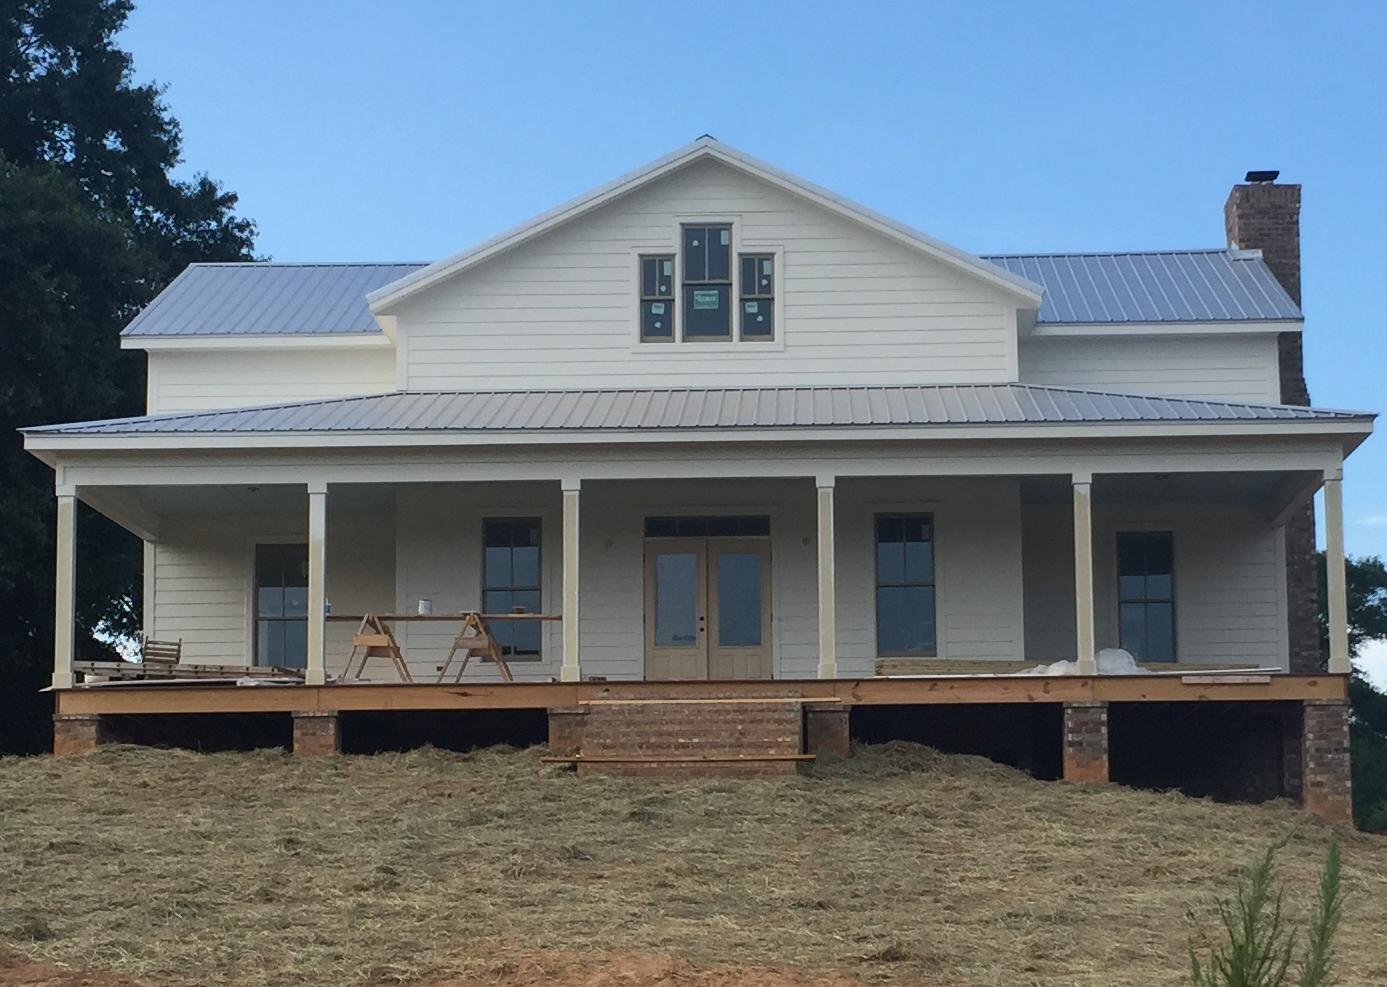 A White Farmhouse